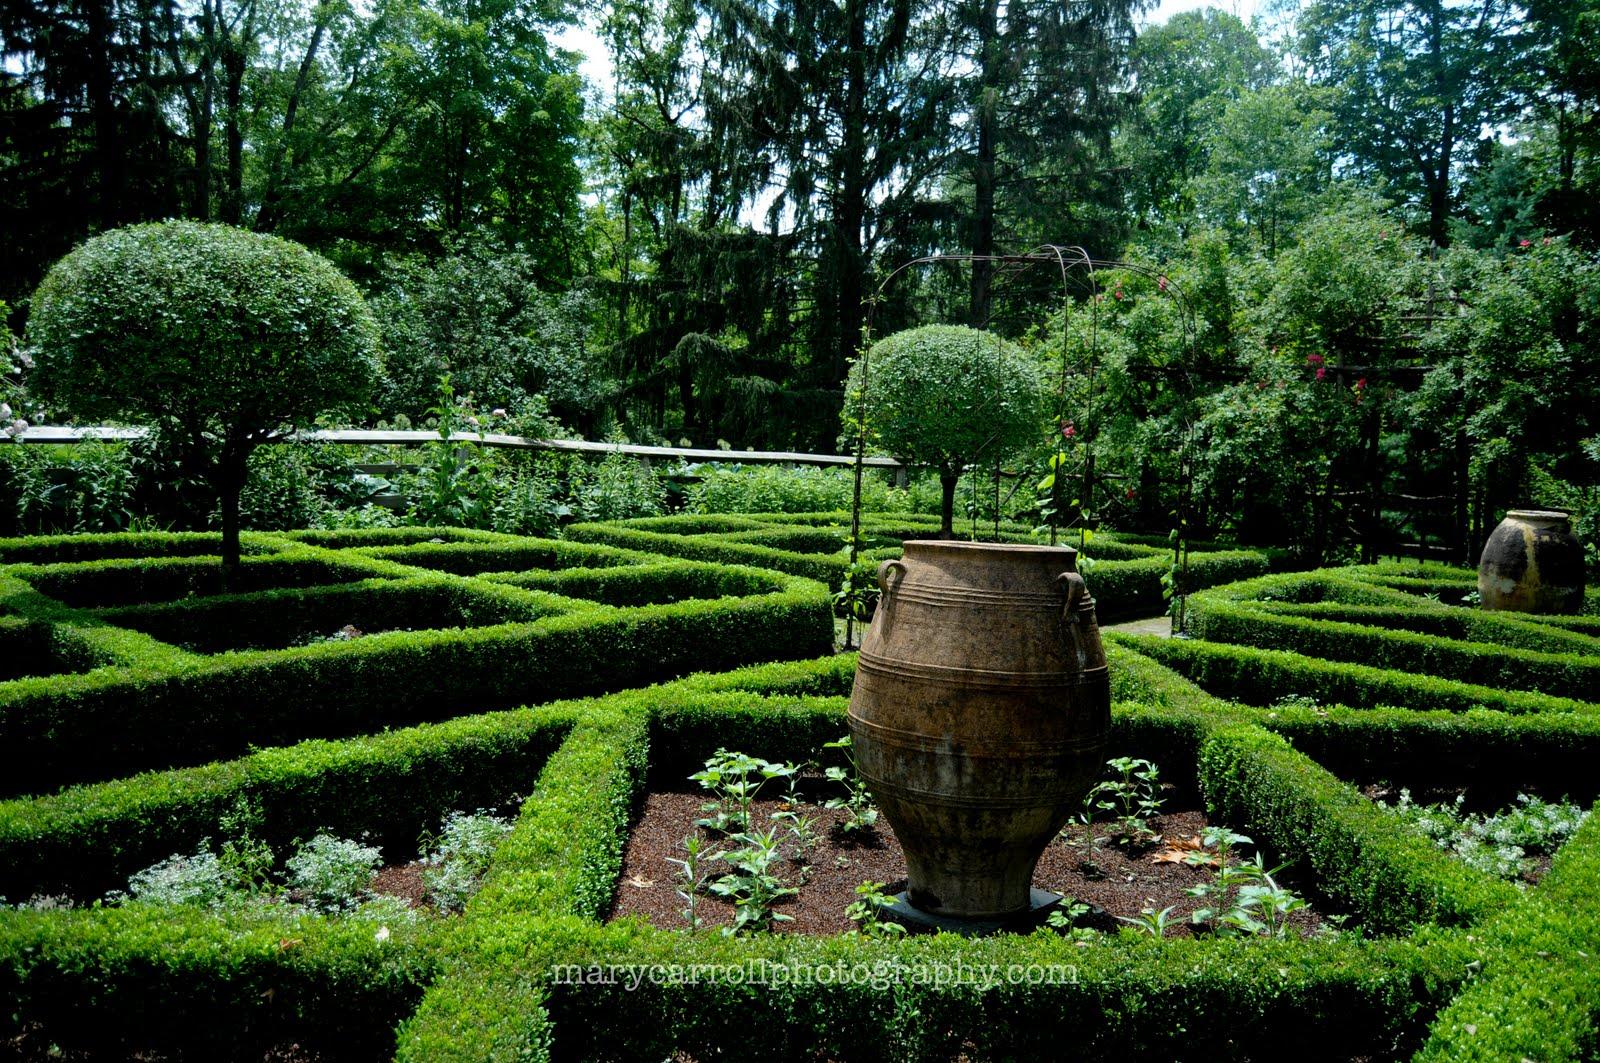 Parterre gardens on pinterest formal gardens hedges and for Parterre vegetable garden design